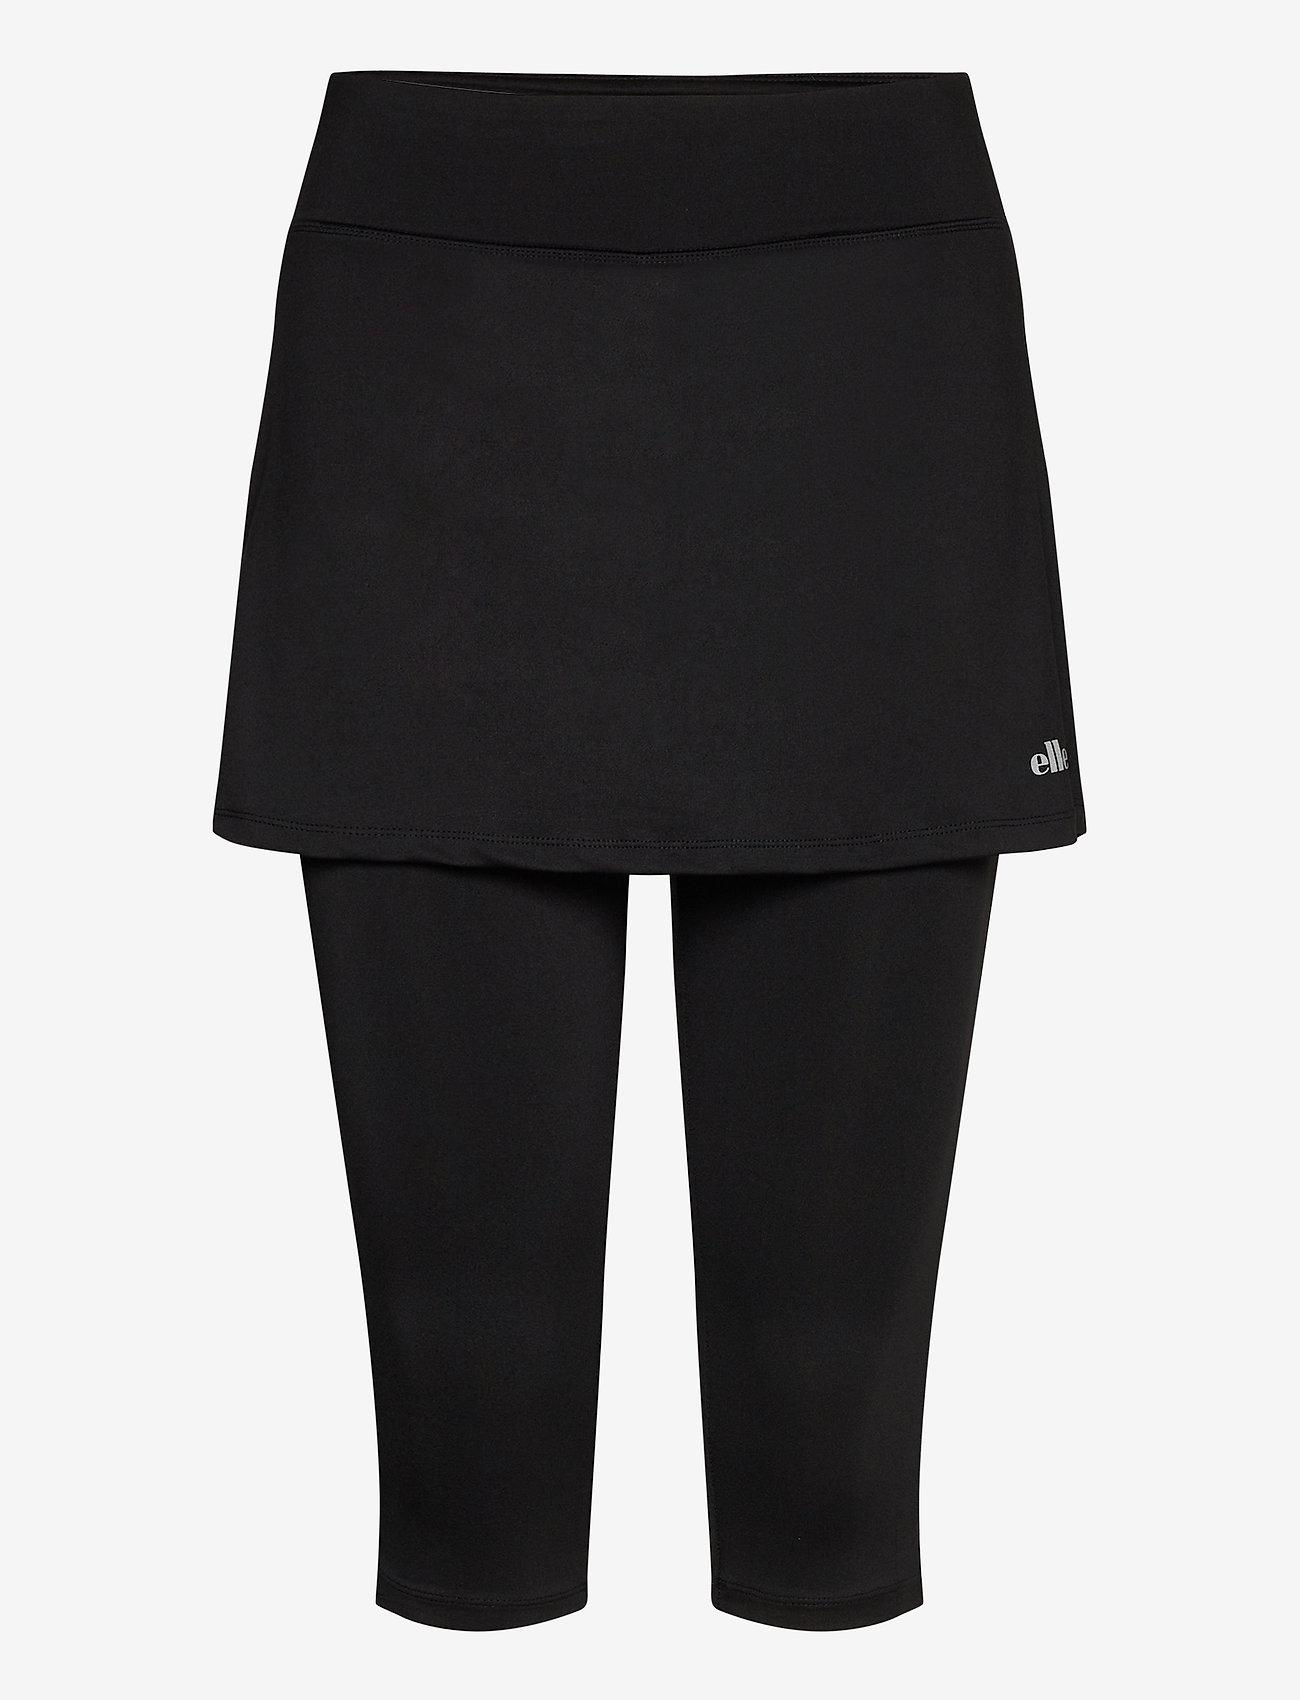 Ellesse - EL LYJA - sports skirts - black - 0